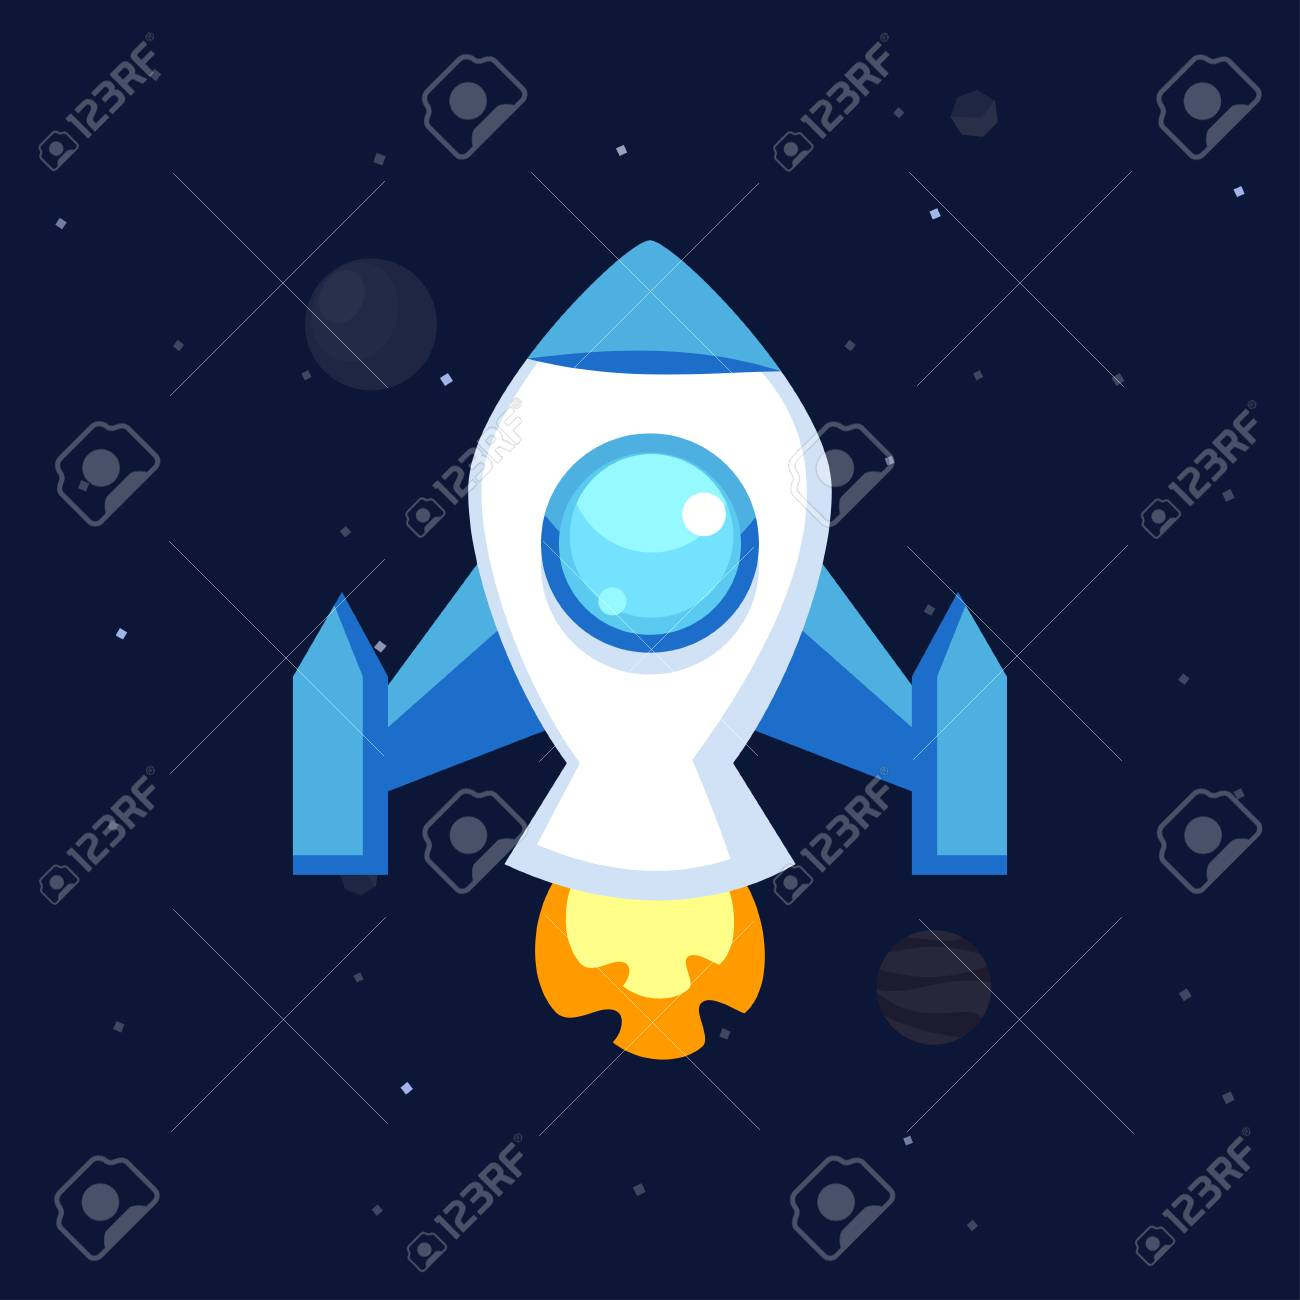 Rocket icons - 69017554